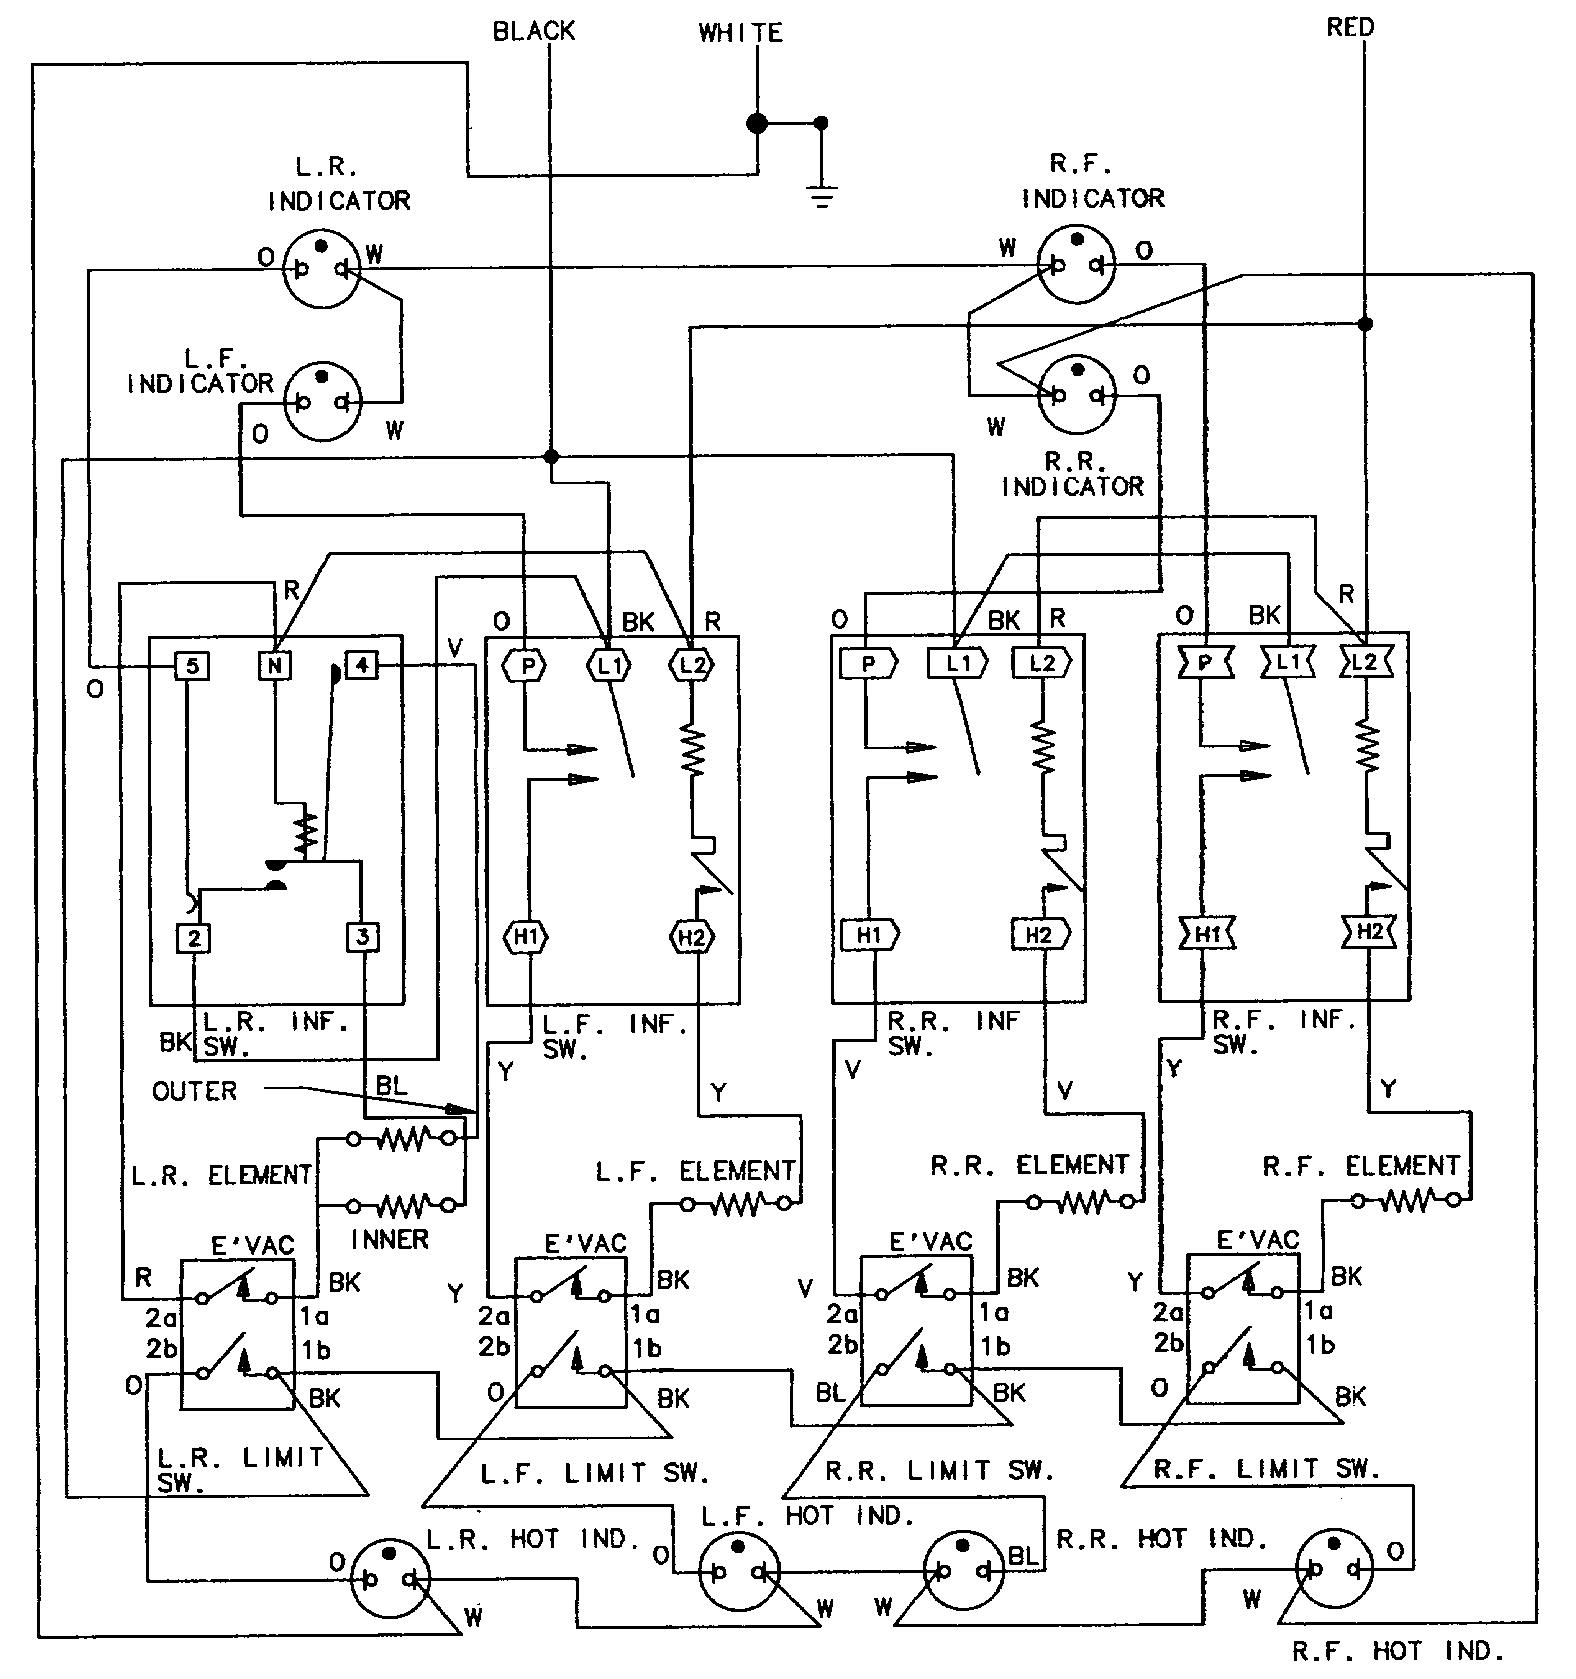 small resolution of jenn air wiring diagram jenn air wiring diagram wiring diagram megajenn air wiring diagram wiring diagram